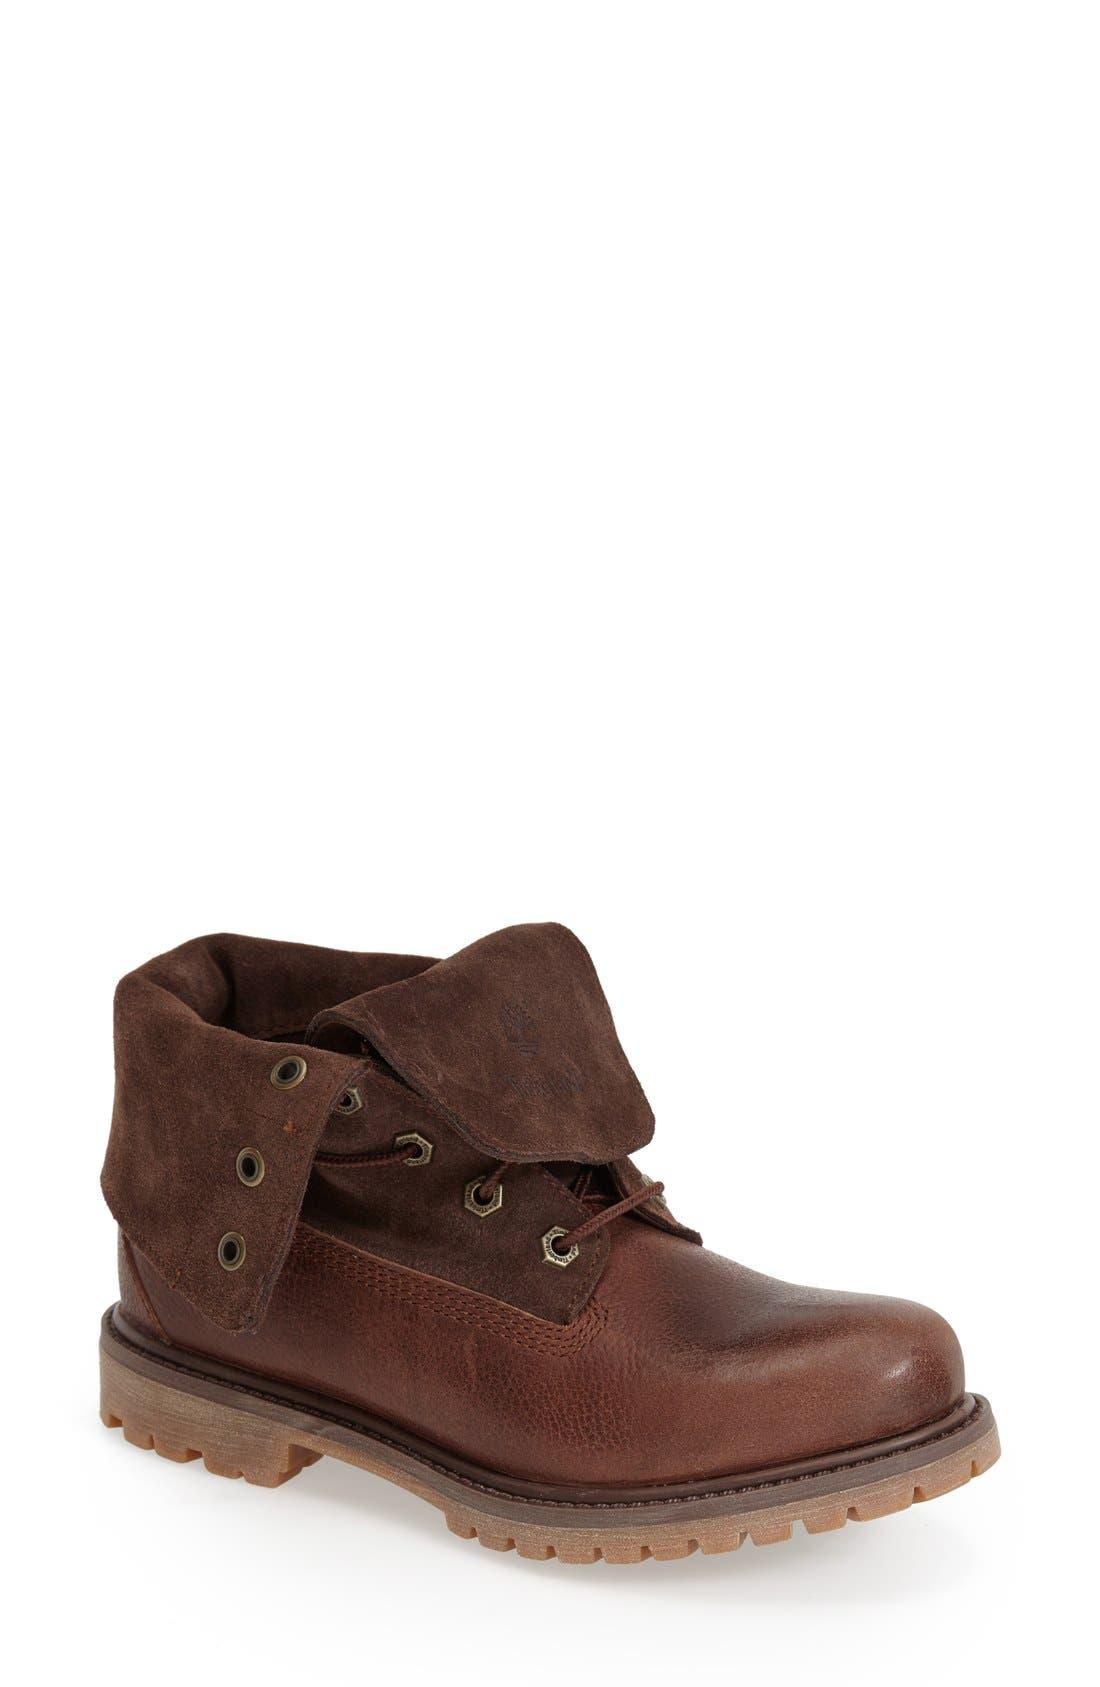 Alternate Image 1 Selected - Timberland Waterproof Leather Boot (Women)